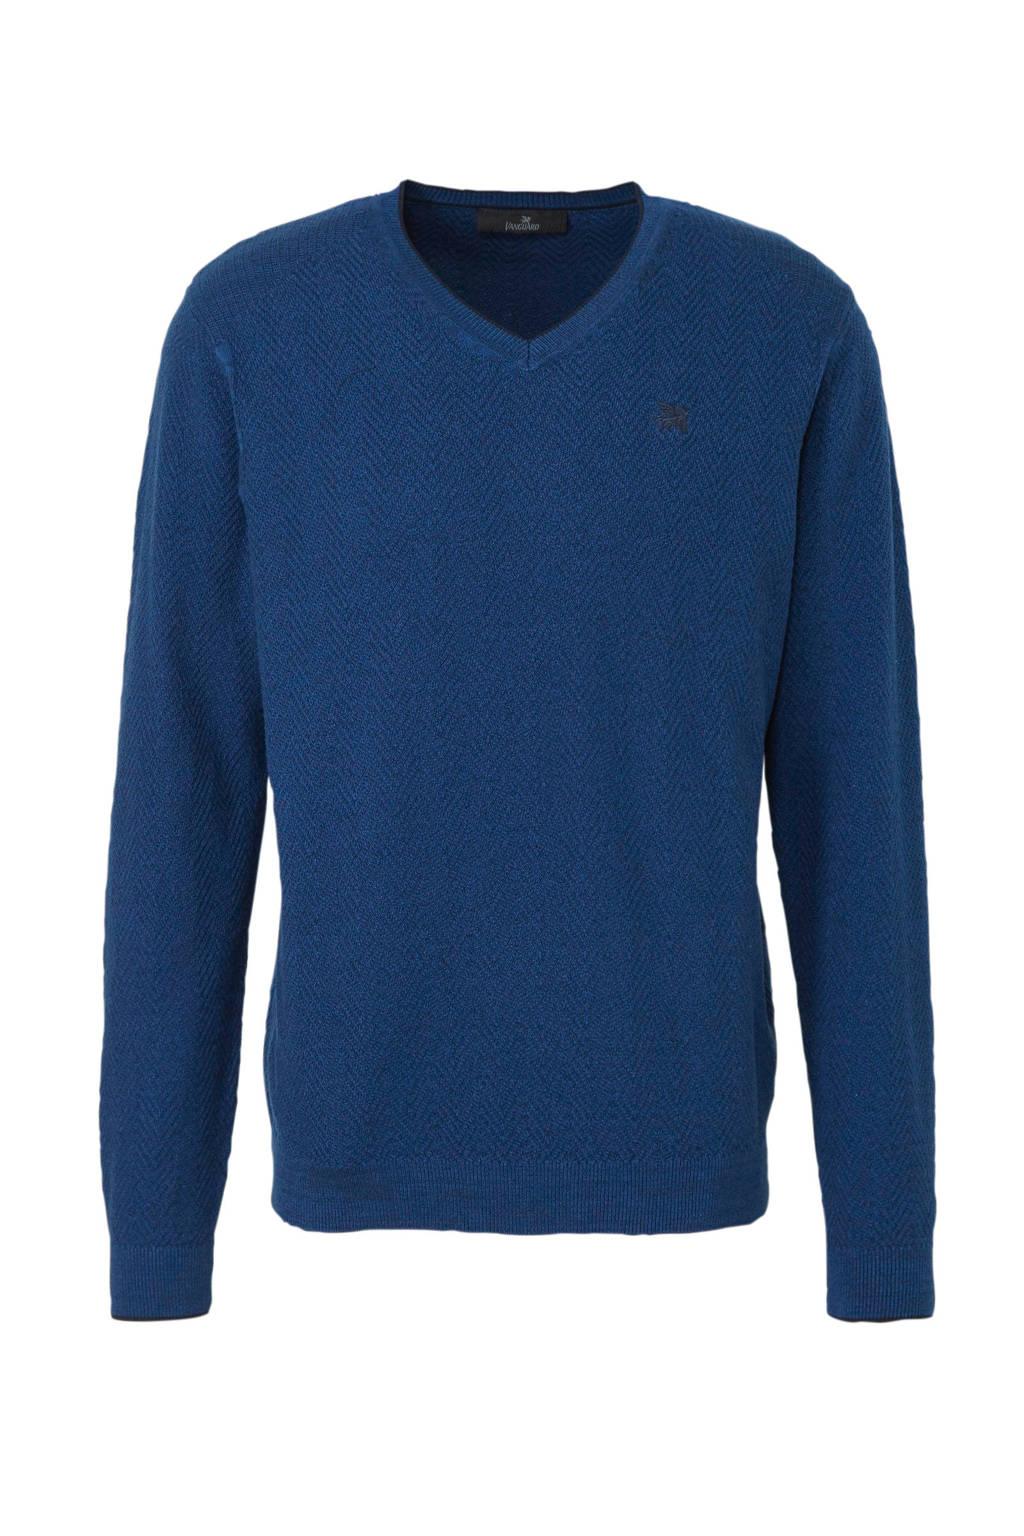 Vanguard fijngebreide trui donkerblauw, Donkerblauw